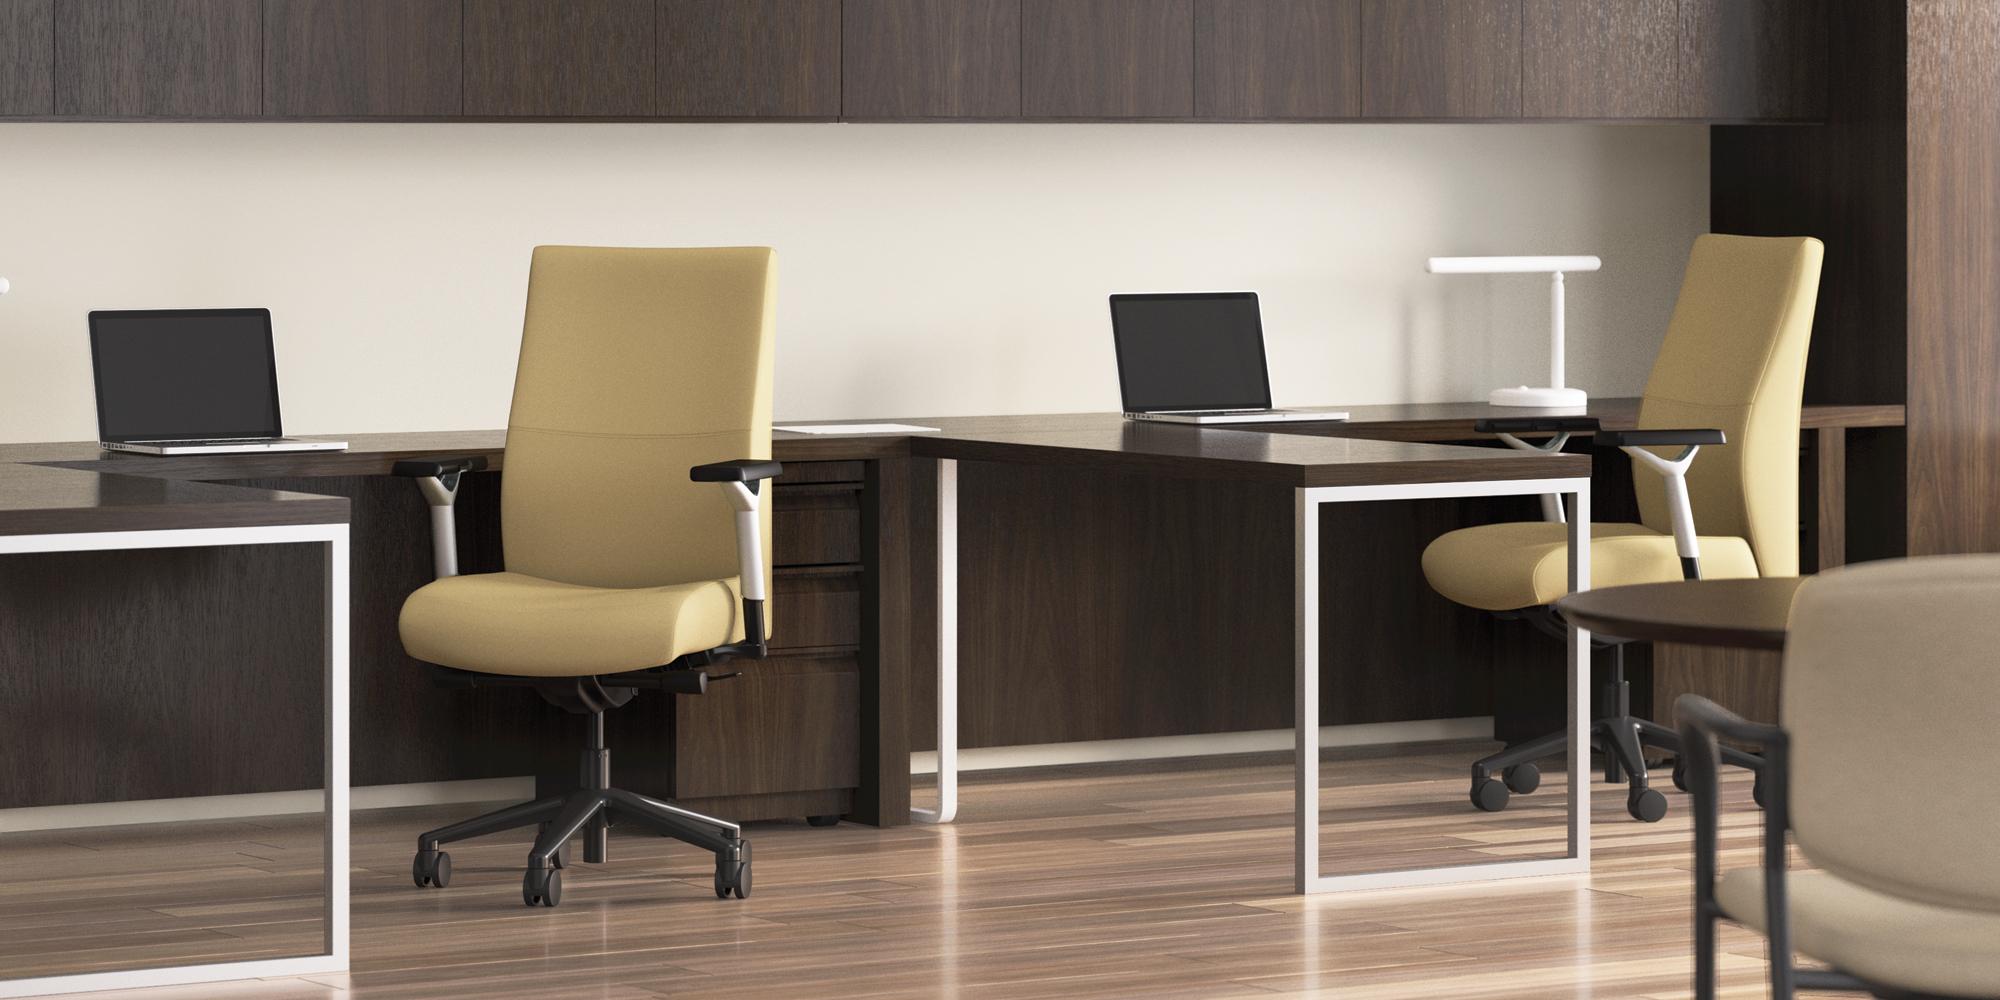 prava_midback_chair_open_office_gallery.jpg